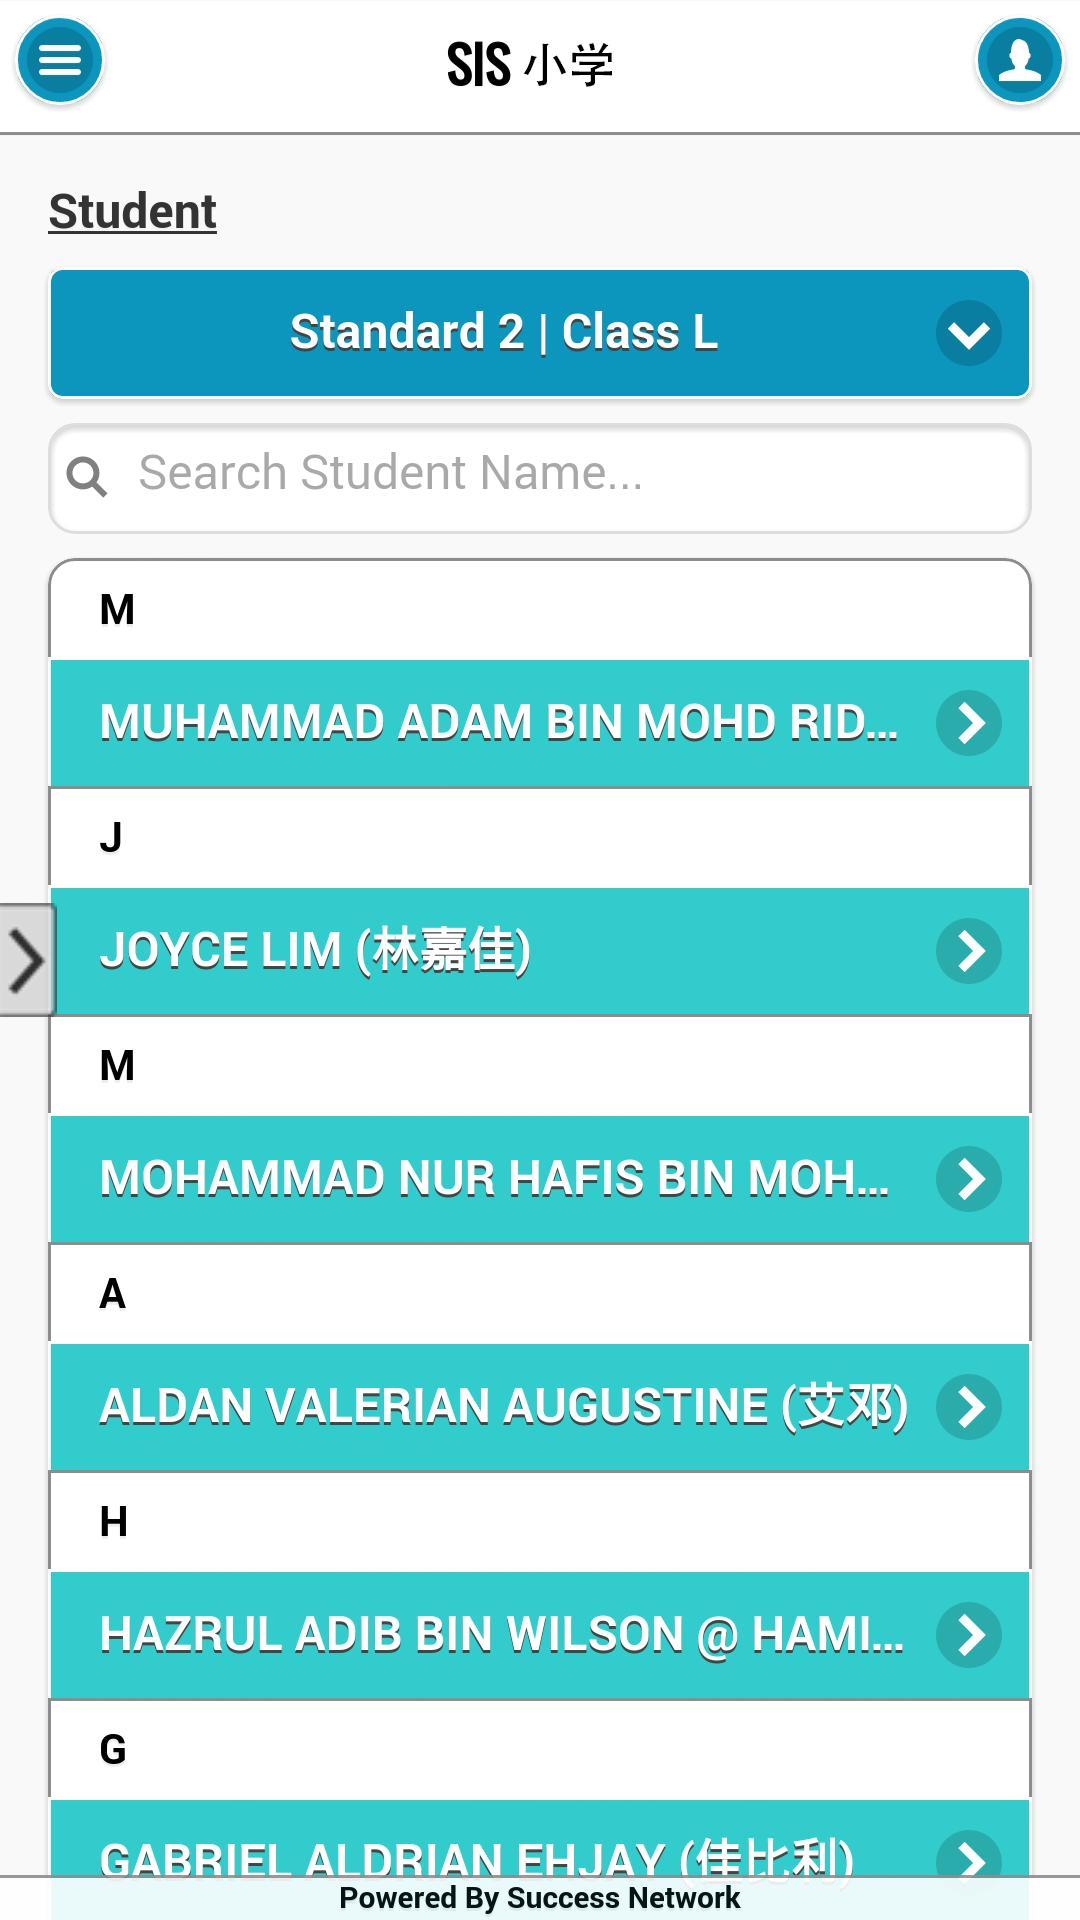 Sjkc Chung Hwa Damansara For Android Apk Download